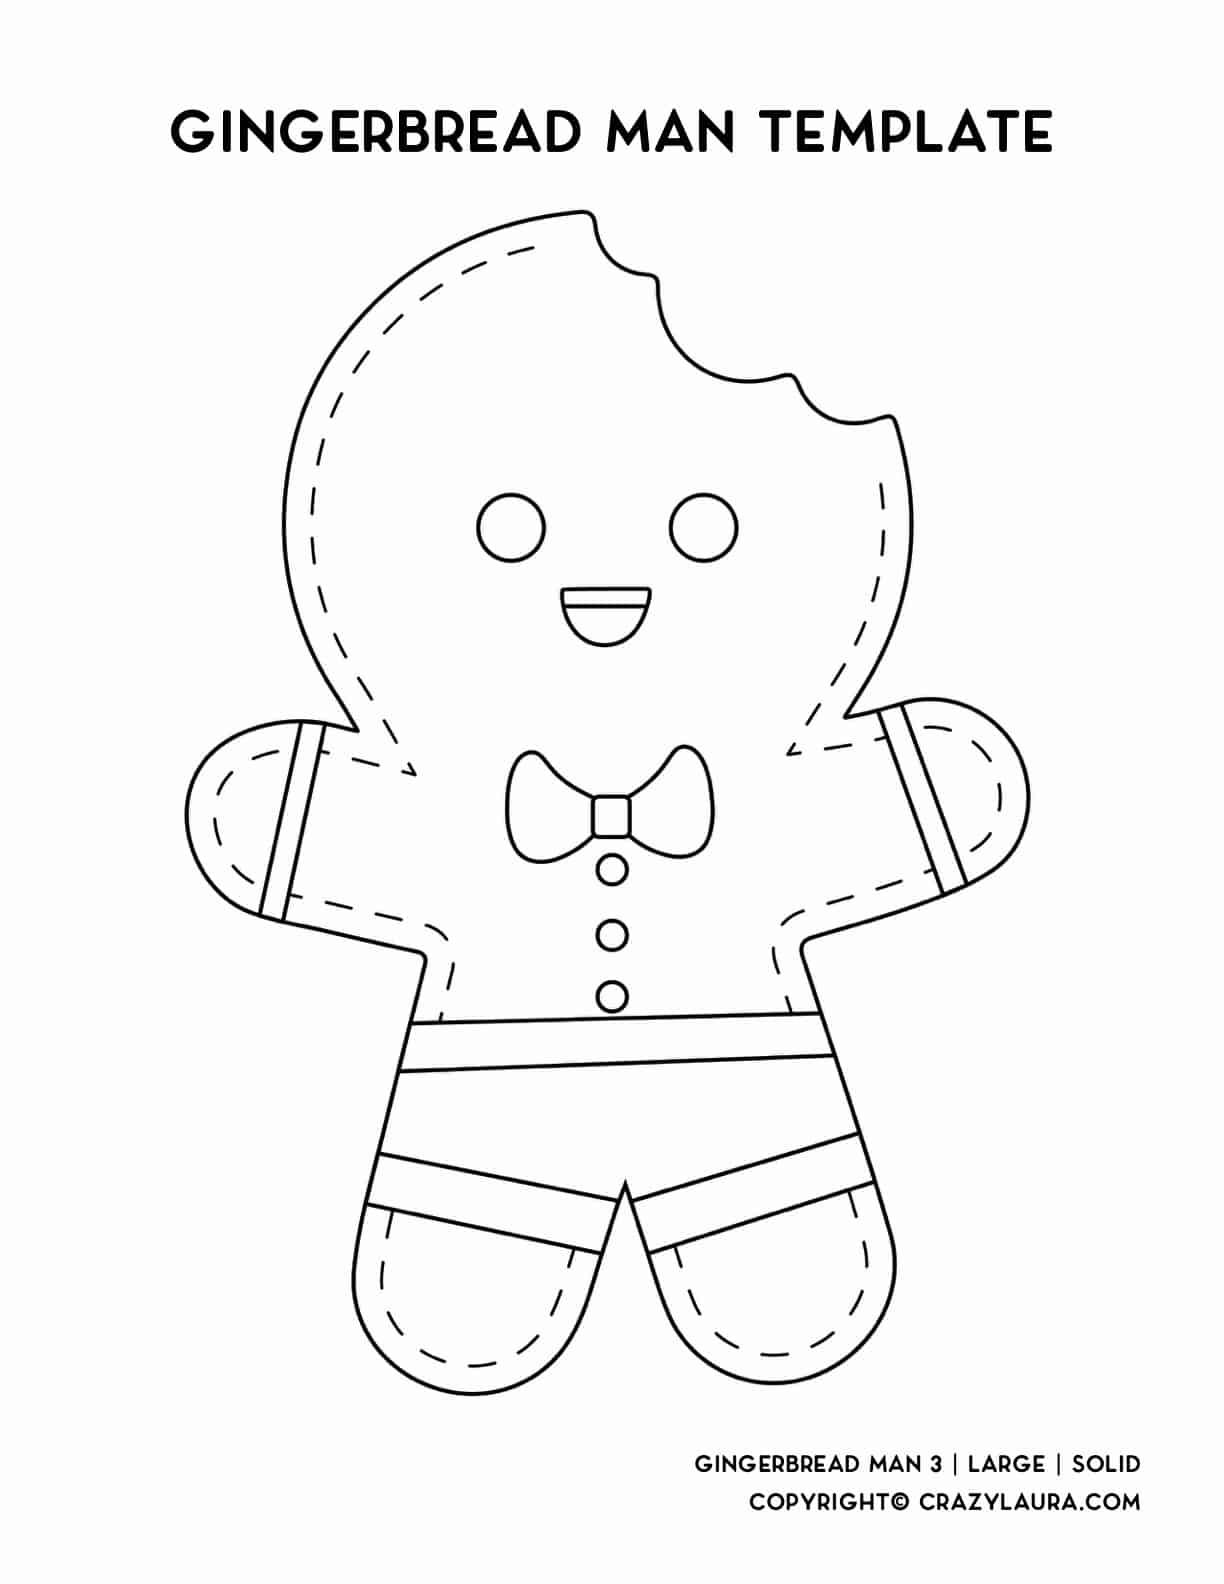 cute smiling gingerbread man coloring printable for kids